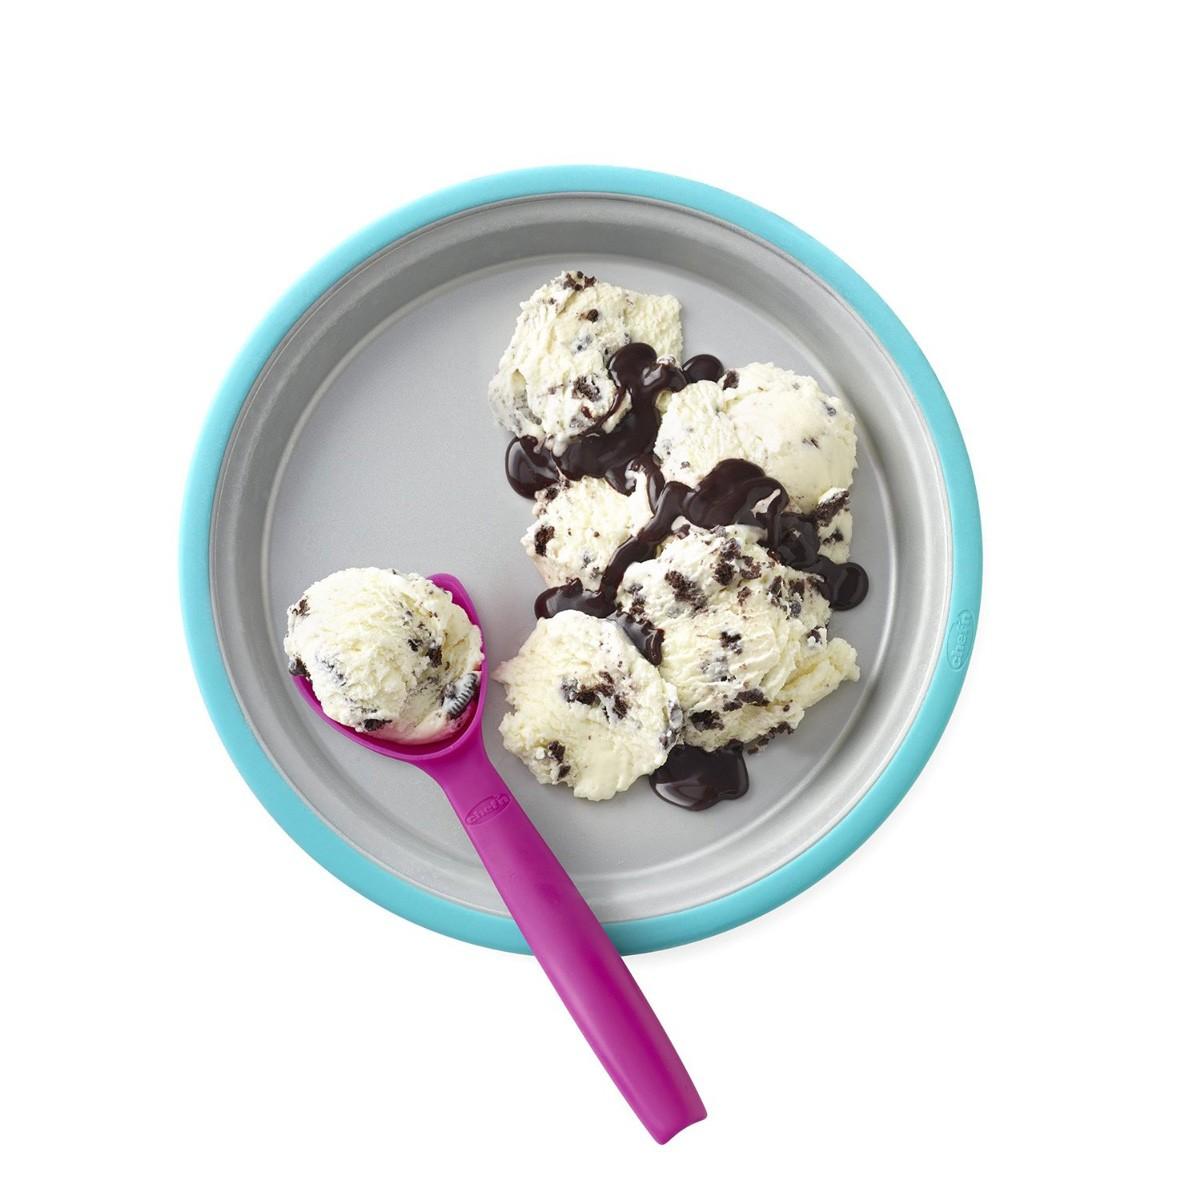 Sweet Spot מכשיר להכנת גלידה, כחול Chef'n עכשיו במחיר מיוחד!